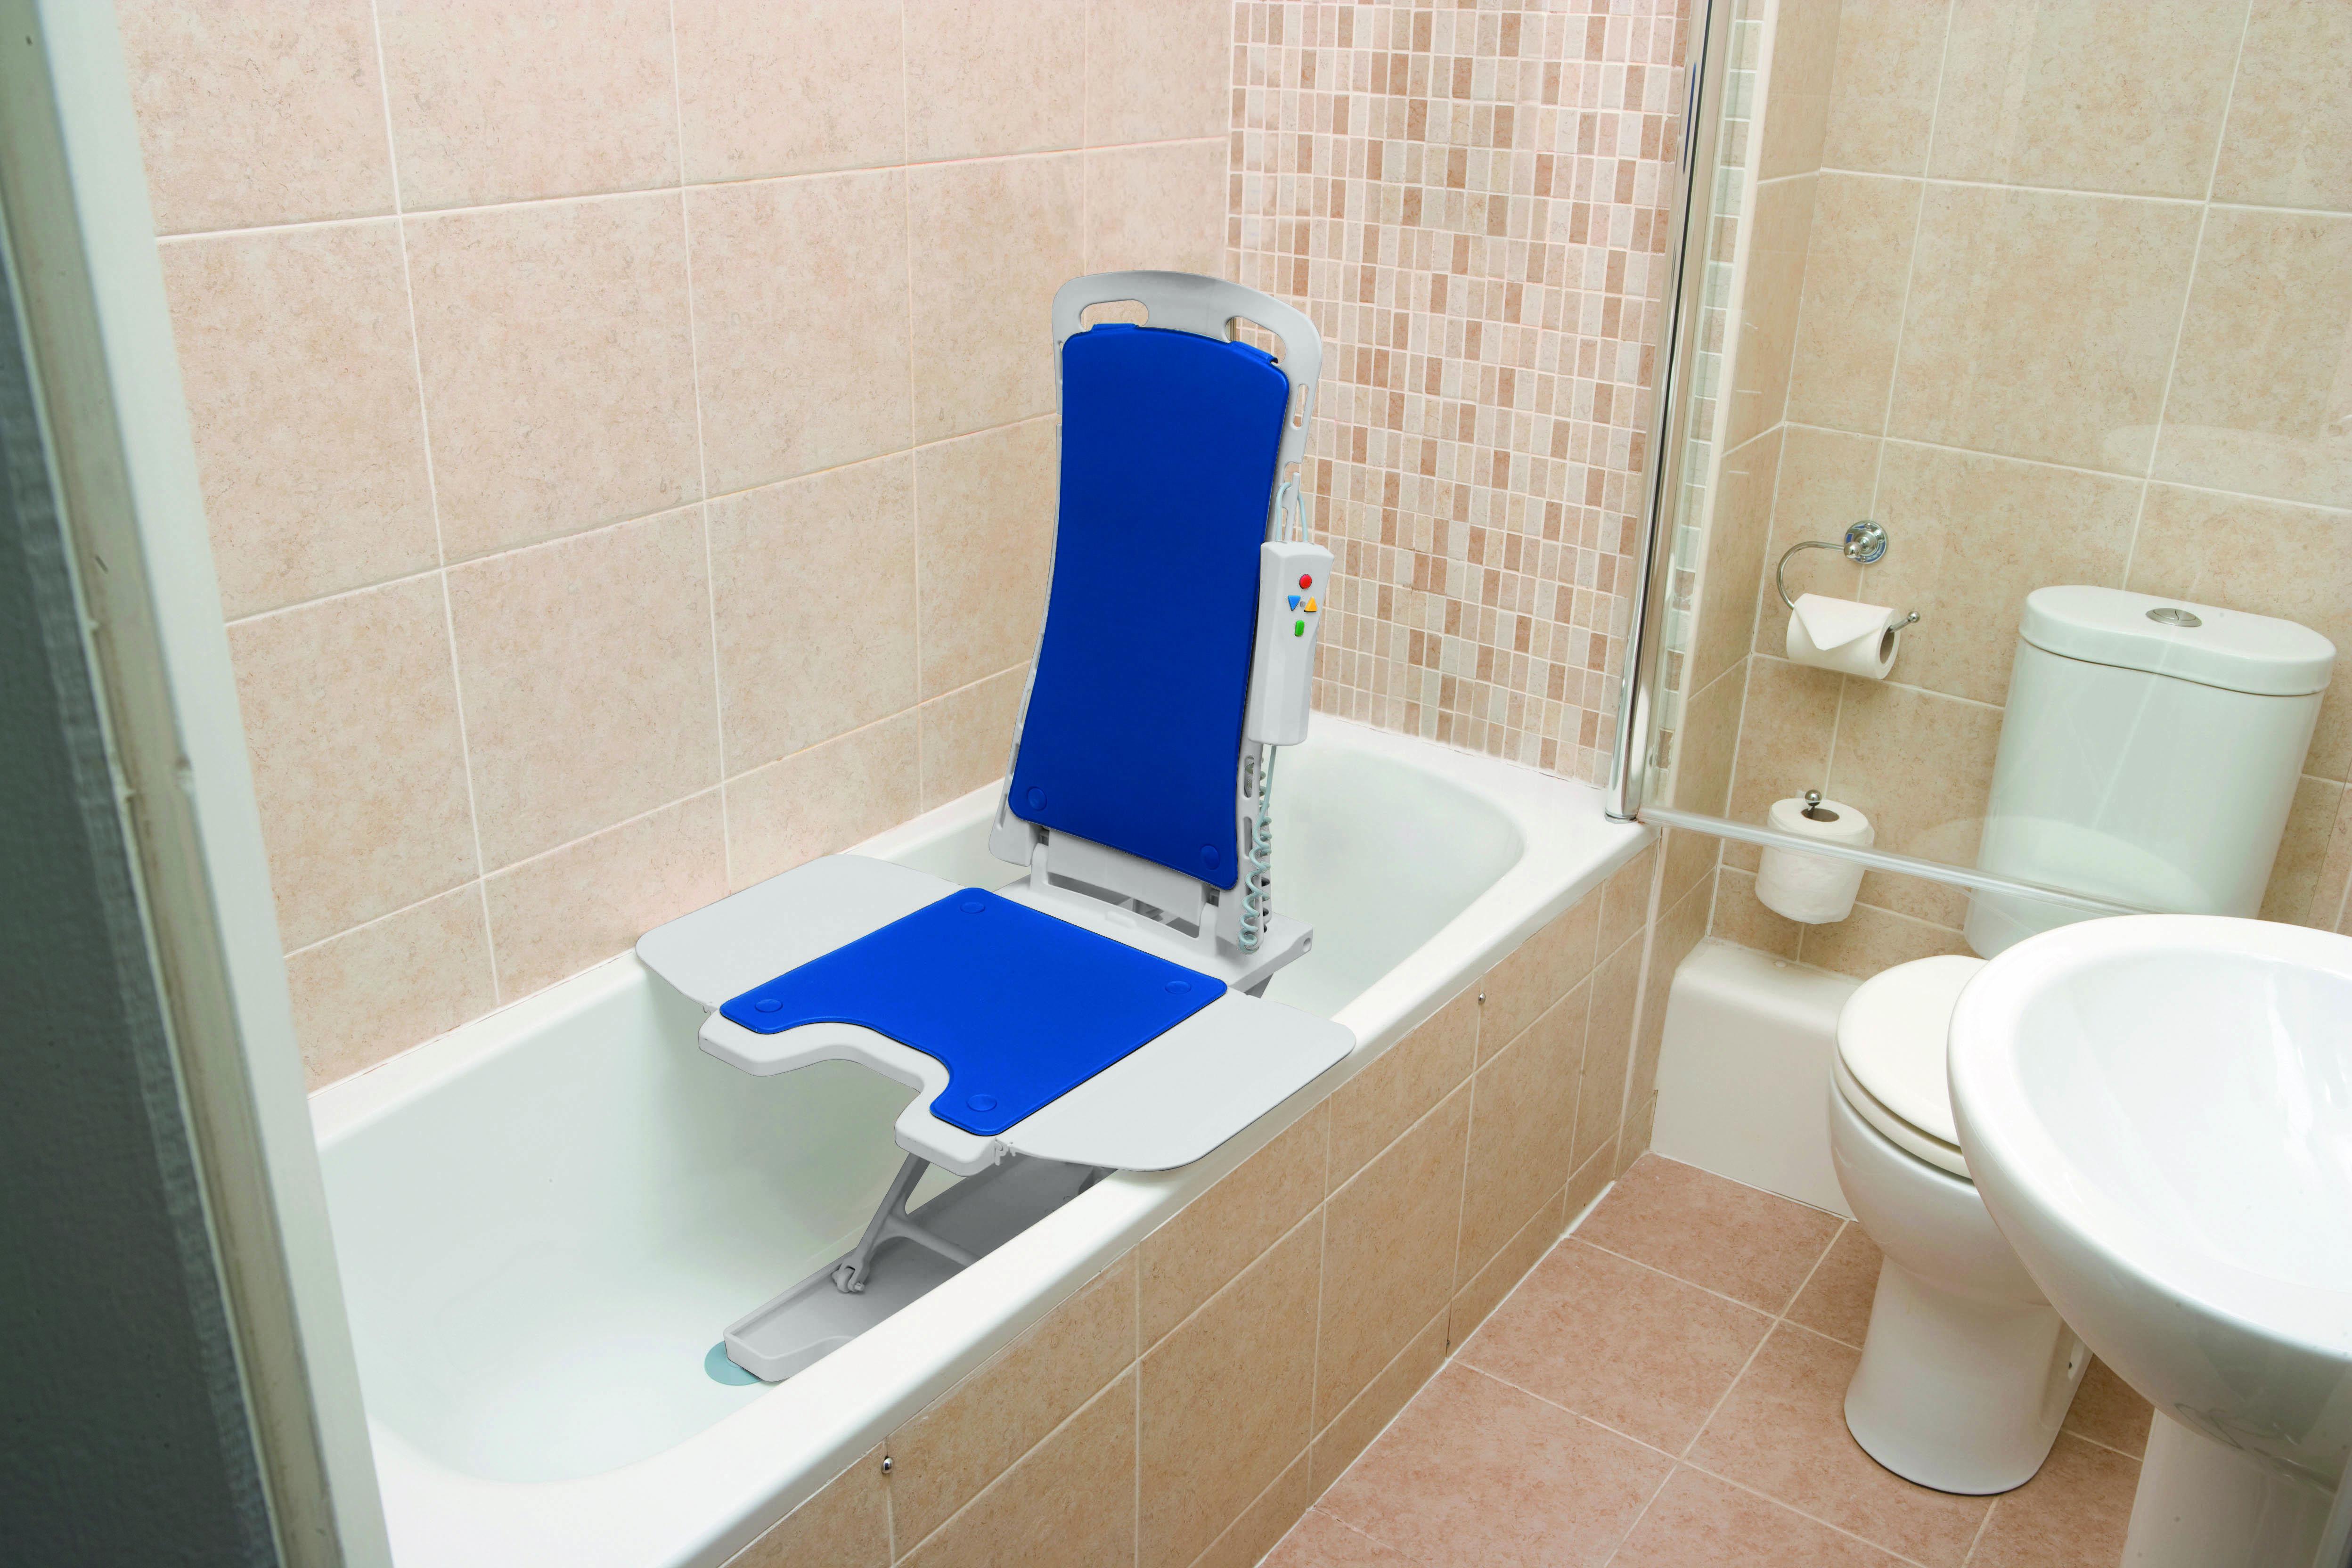 whisper-automatic-bath-lift-477150312-drive-medical-3.jpg